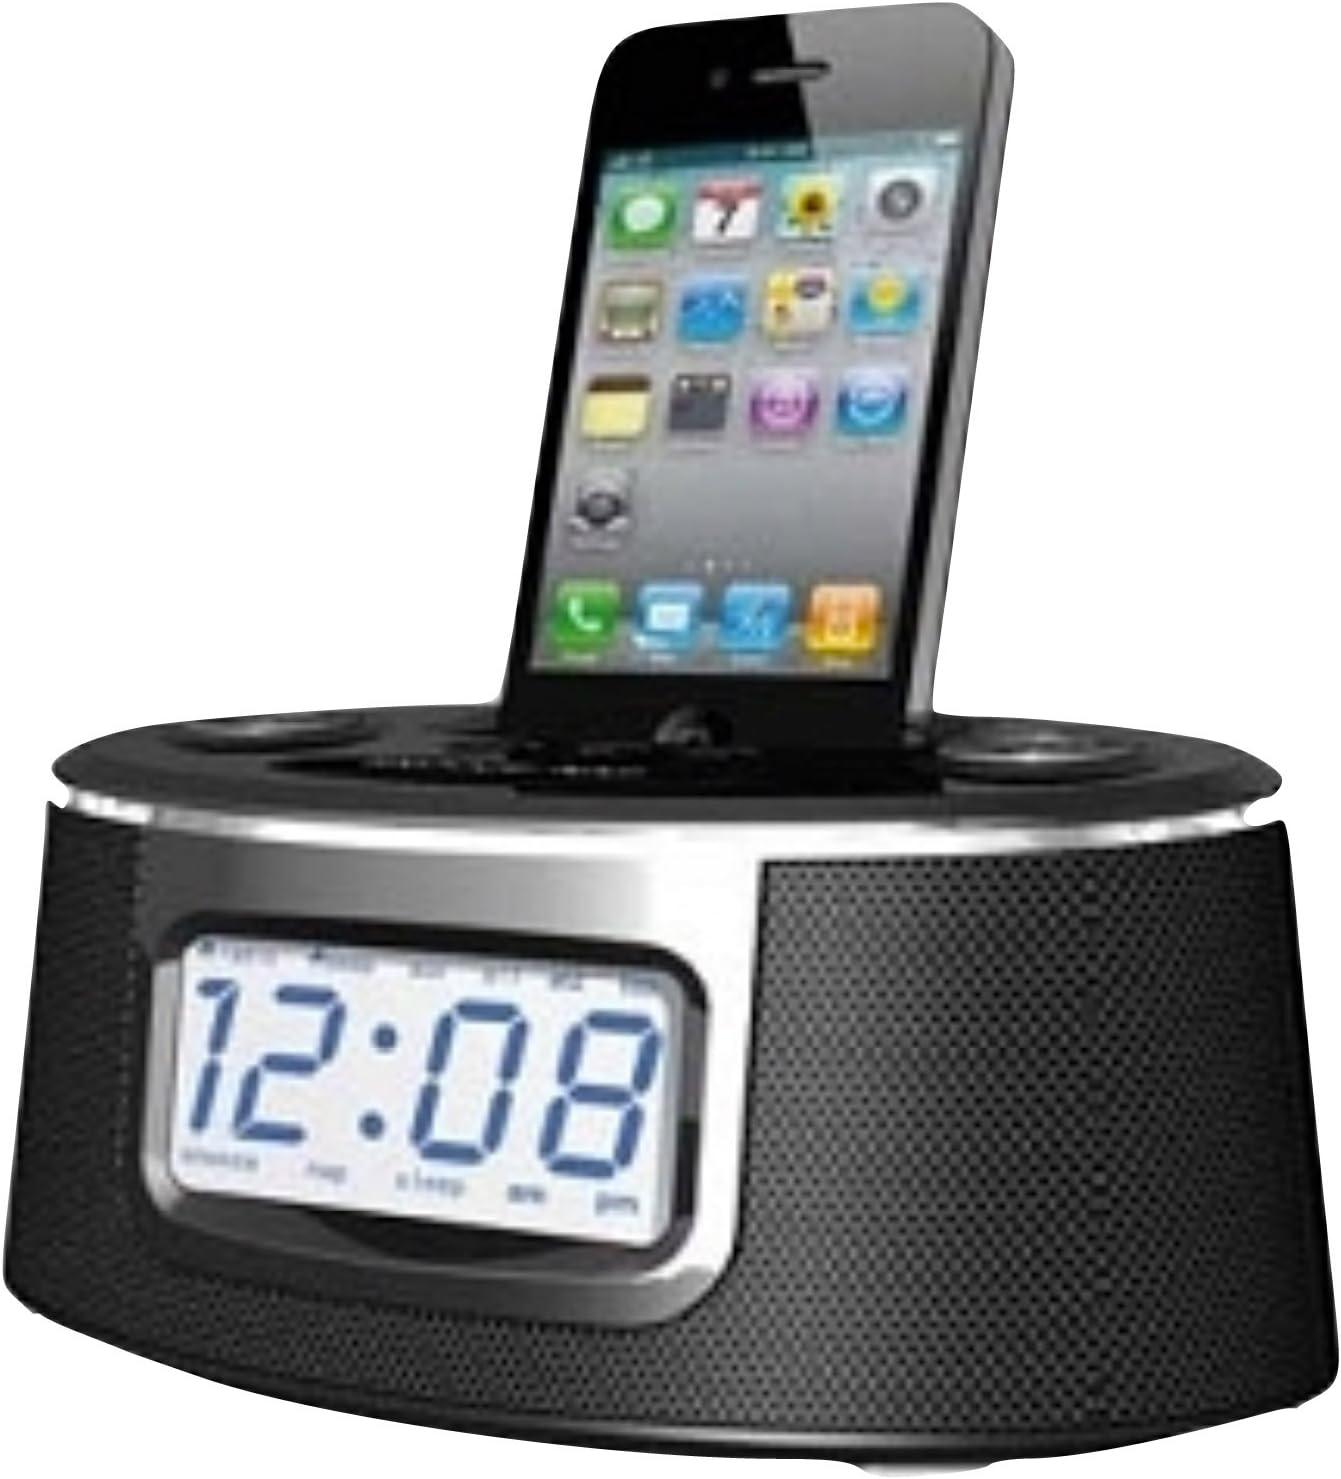 Cresta IPD300 Negro Acoplamiento Altavoz - Altavoces (iPhone,iPod, LCD, Negro, Digital, Corriente alterna, Batería, AAA)